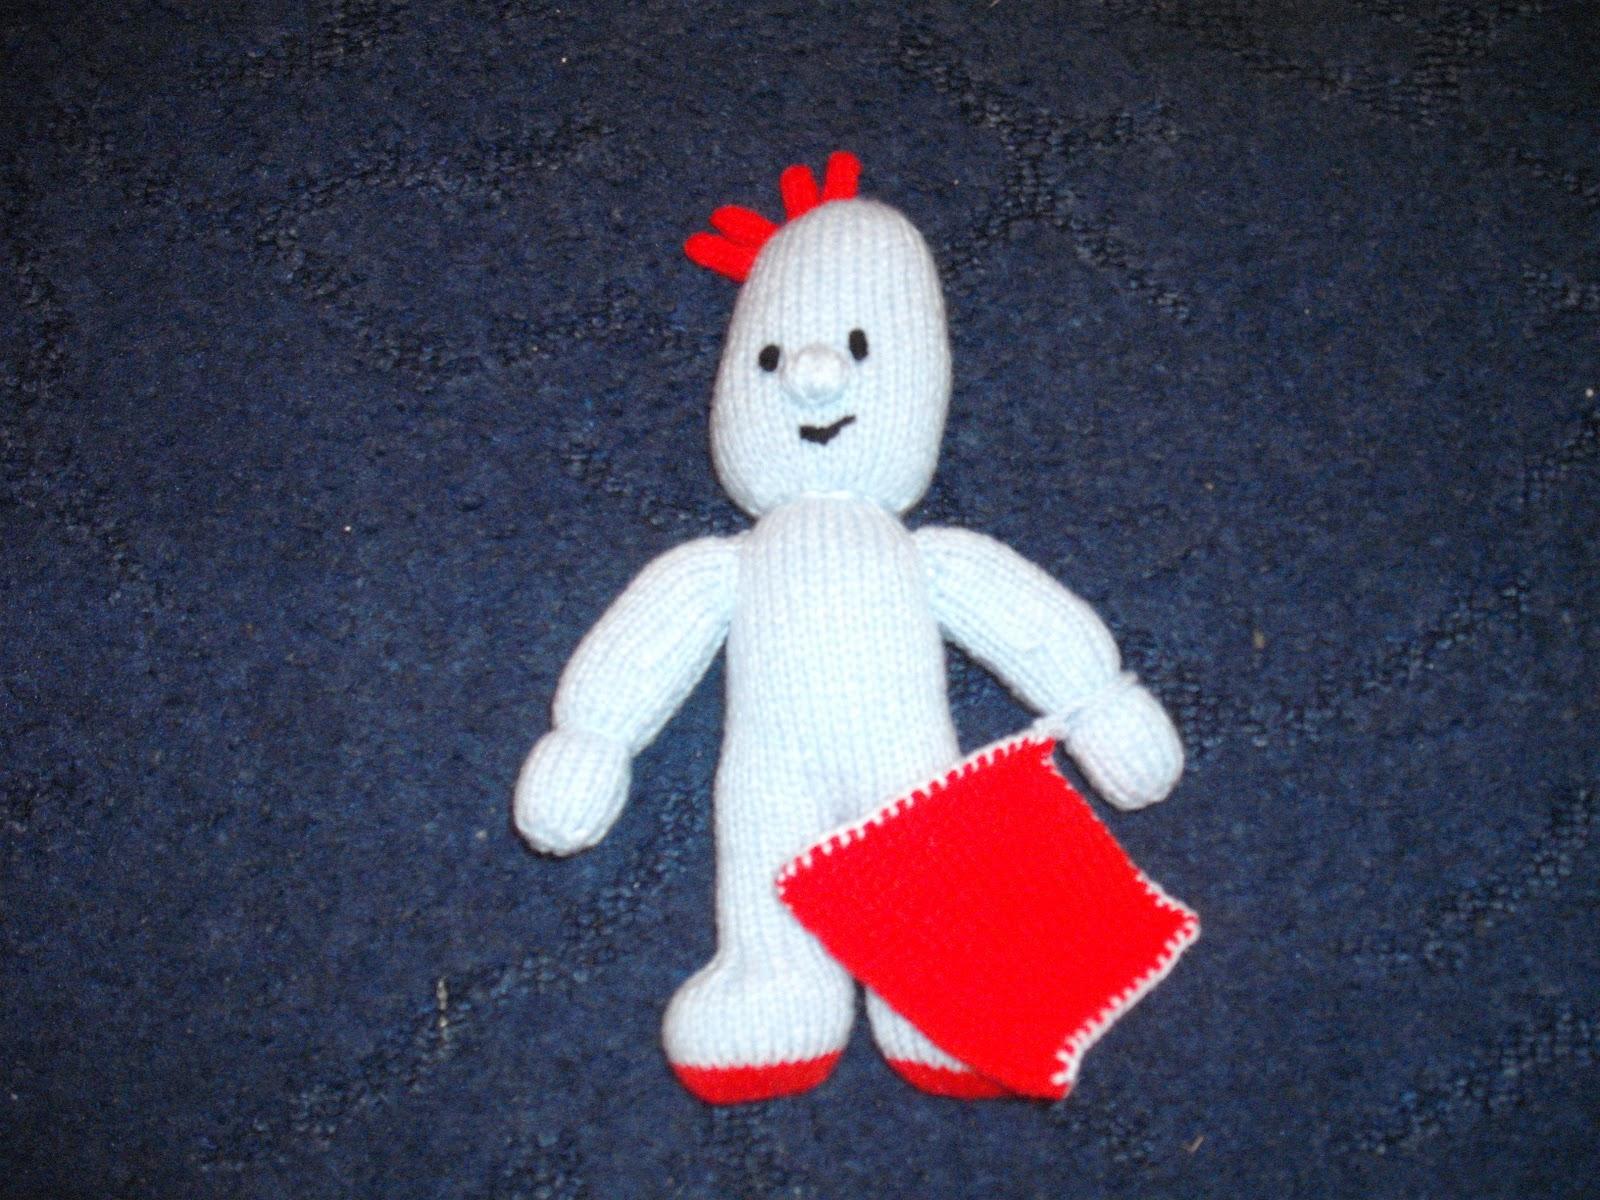 Knitting Pattern For Iggle Piggle Toy : mrs eviltedi: Iggle Piggle